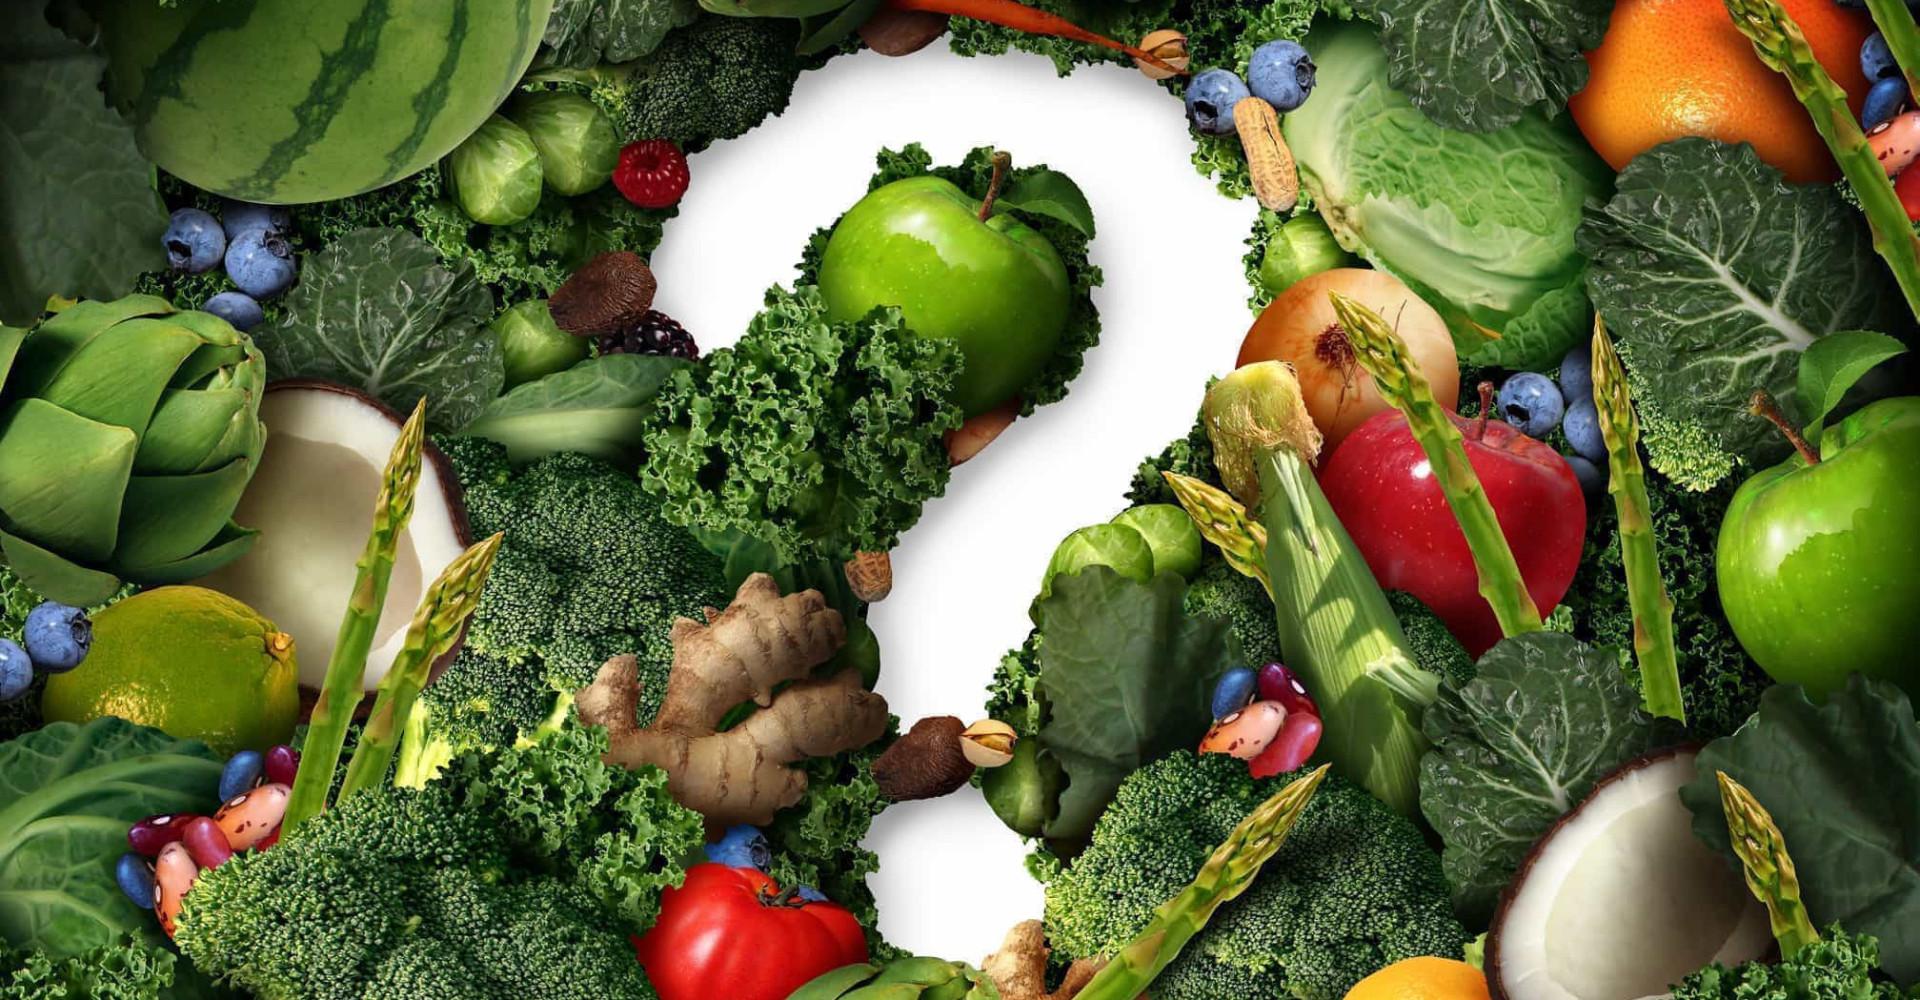 Demystifying terrifyingly false food myths